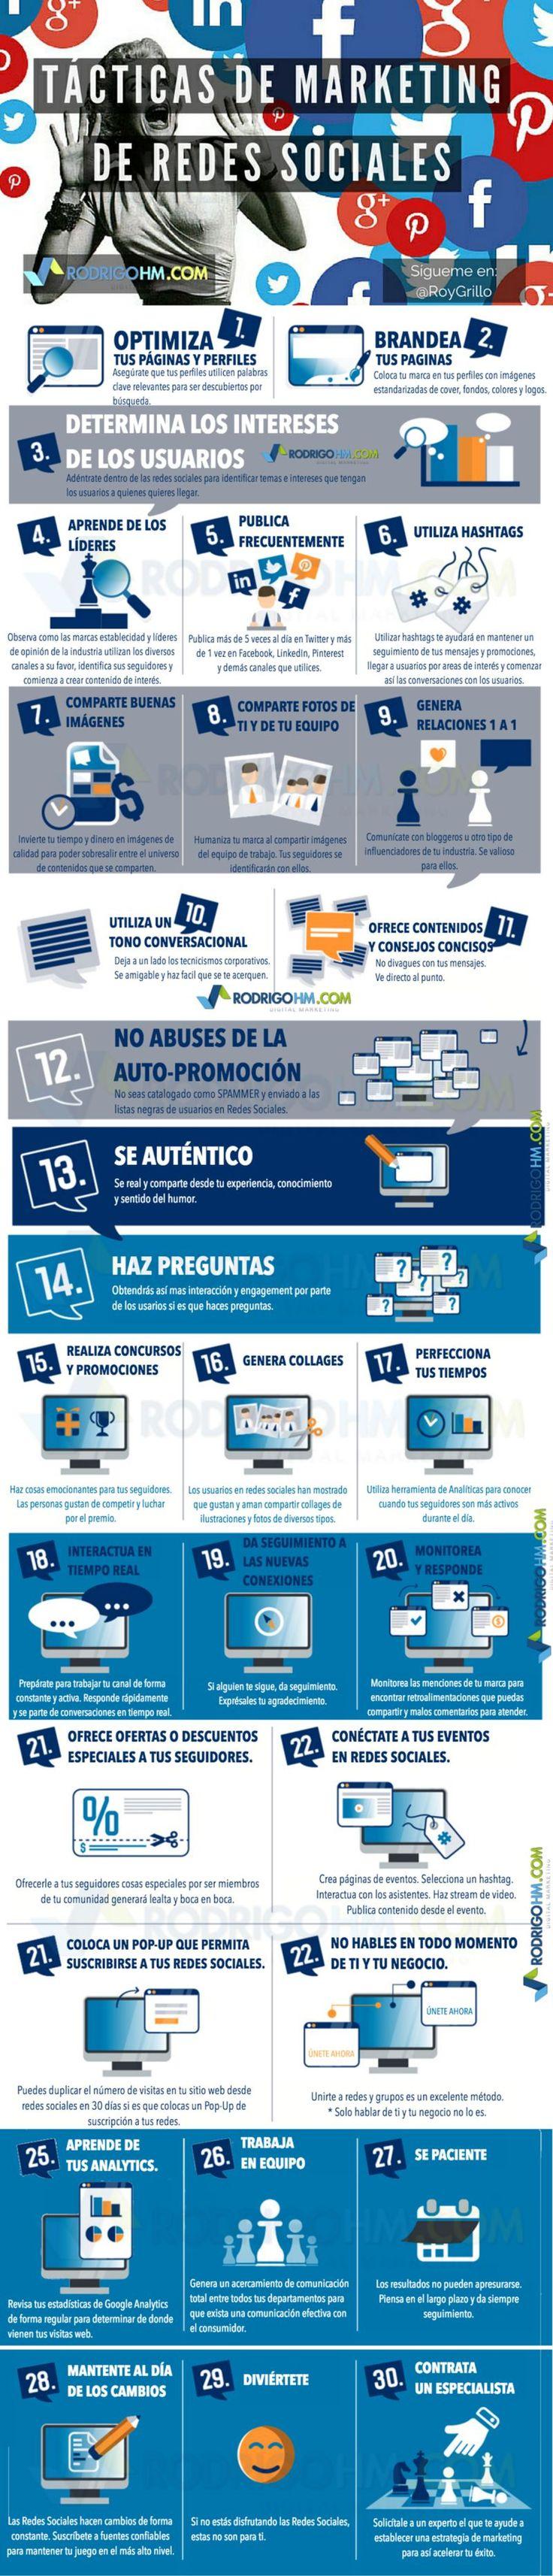 30 Tácticas de Marketing en Redes Sociales - Infografía